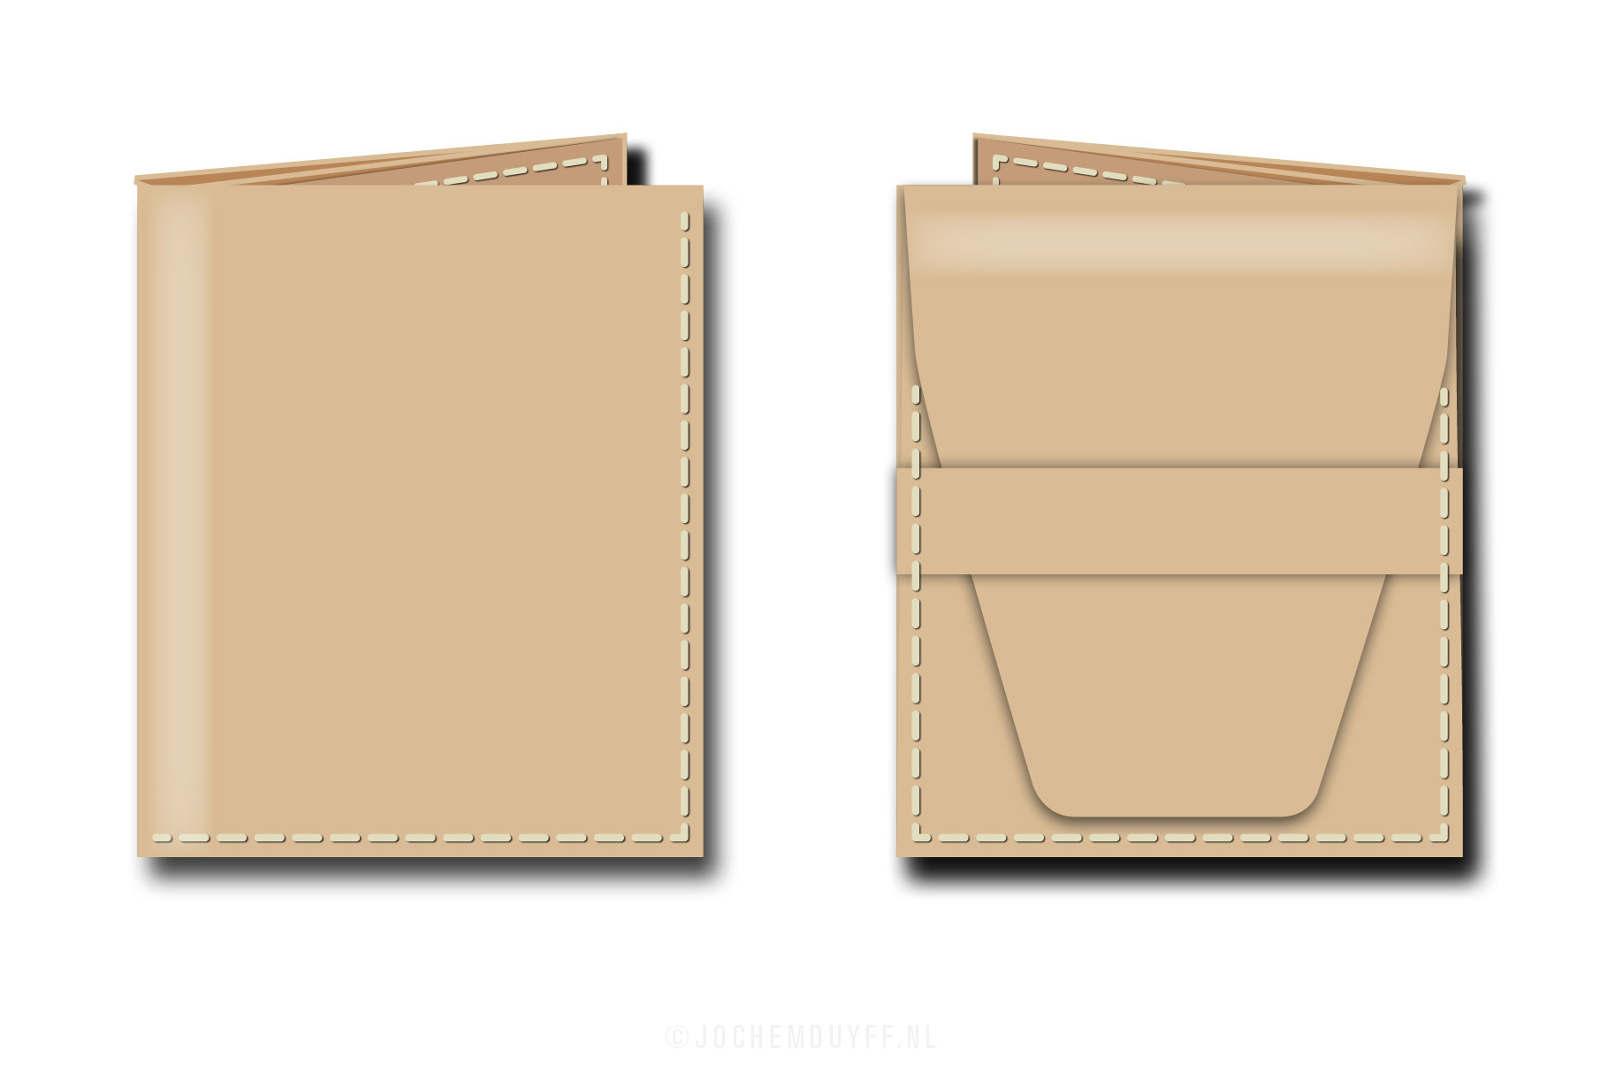 Portemonnee Design.A Custom Wallet Where Design Meets Craftmanship Jochem Duyff